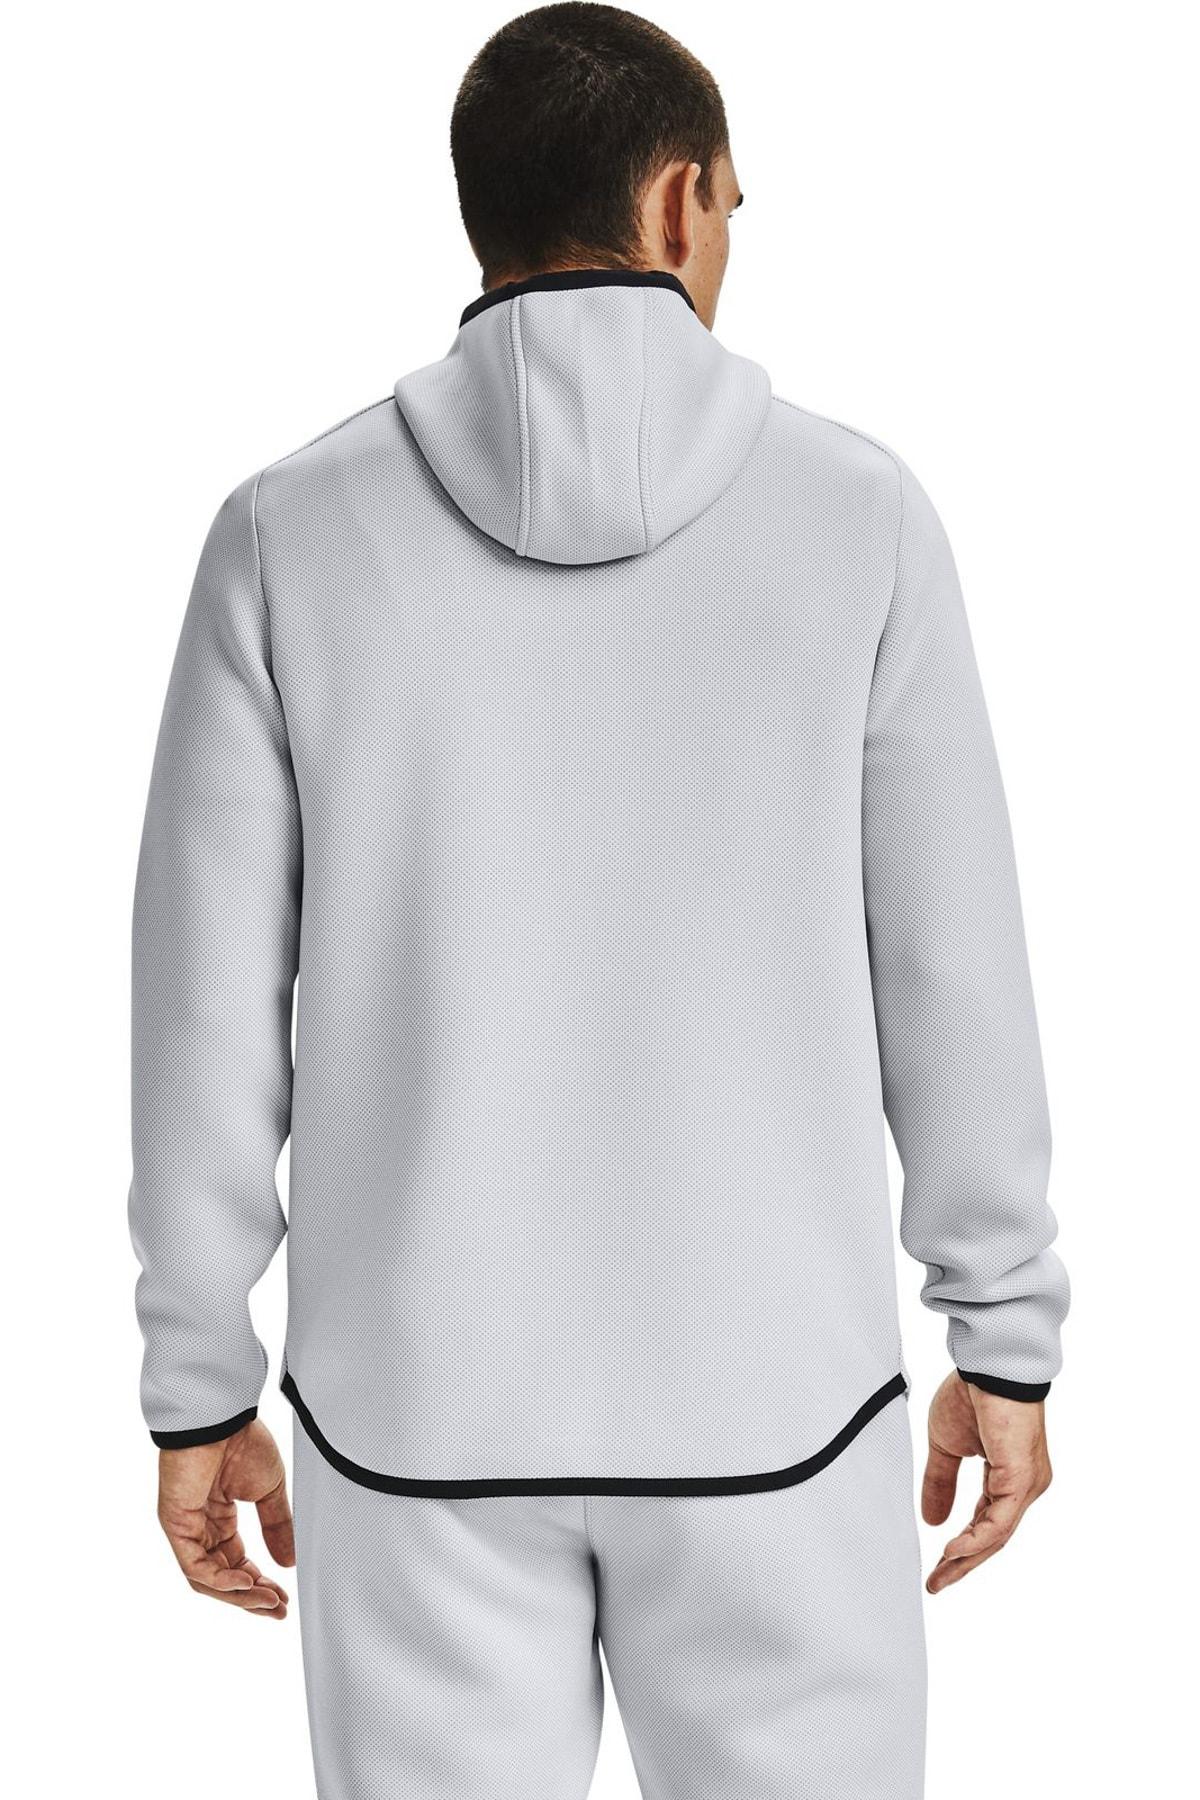 Under Armour Erkek Spor Sweatshirt - Ua /Move 1/2 Hoodie - 1354977-014 2